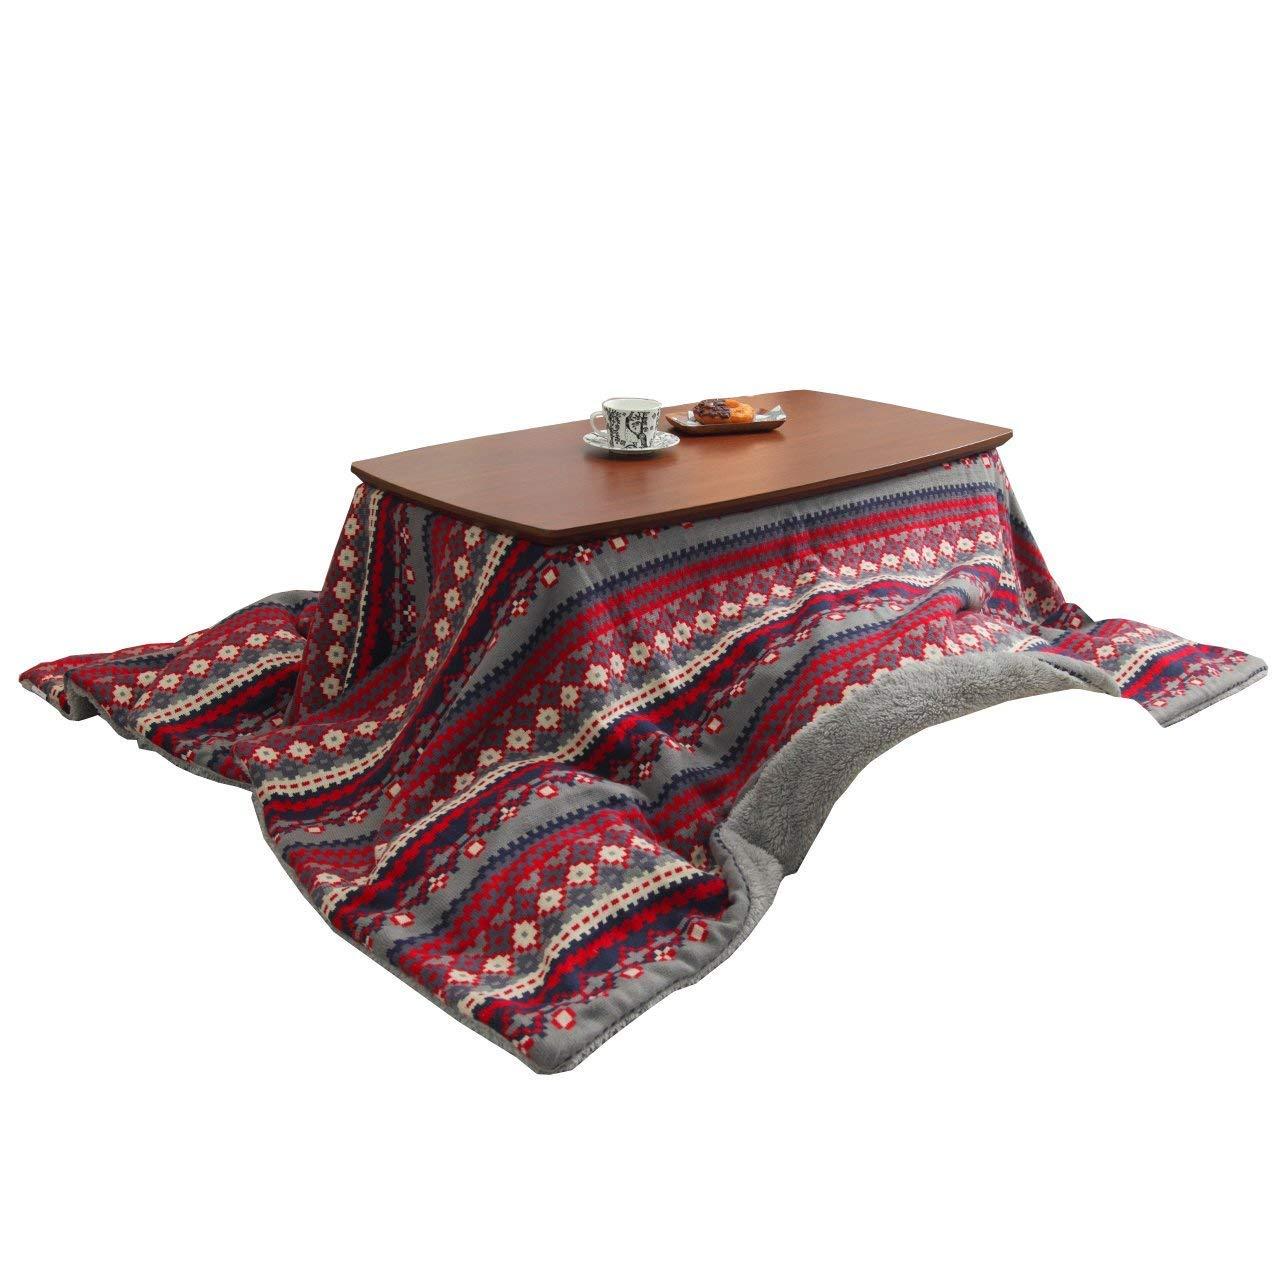 【5%OFF】 2通りの高さ調節でソファーでも使える フラットヒーターこたつセット 105×55 B07JDGQ732 継ぎ脚 (イエロー) B07JDGQ732 レッド 105×55 レッド レッド, チヂワチョウ:bbe2b0da --- svecha37.ru